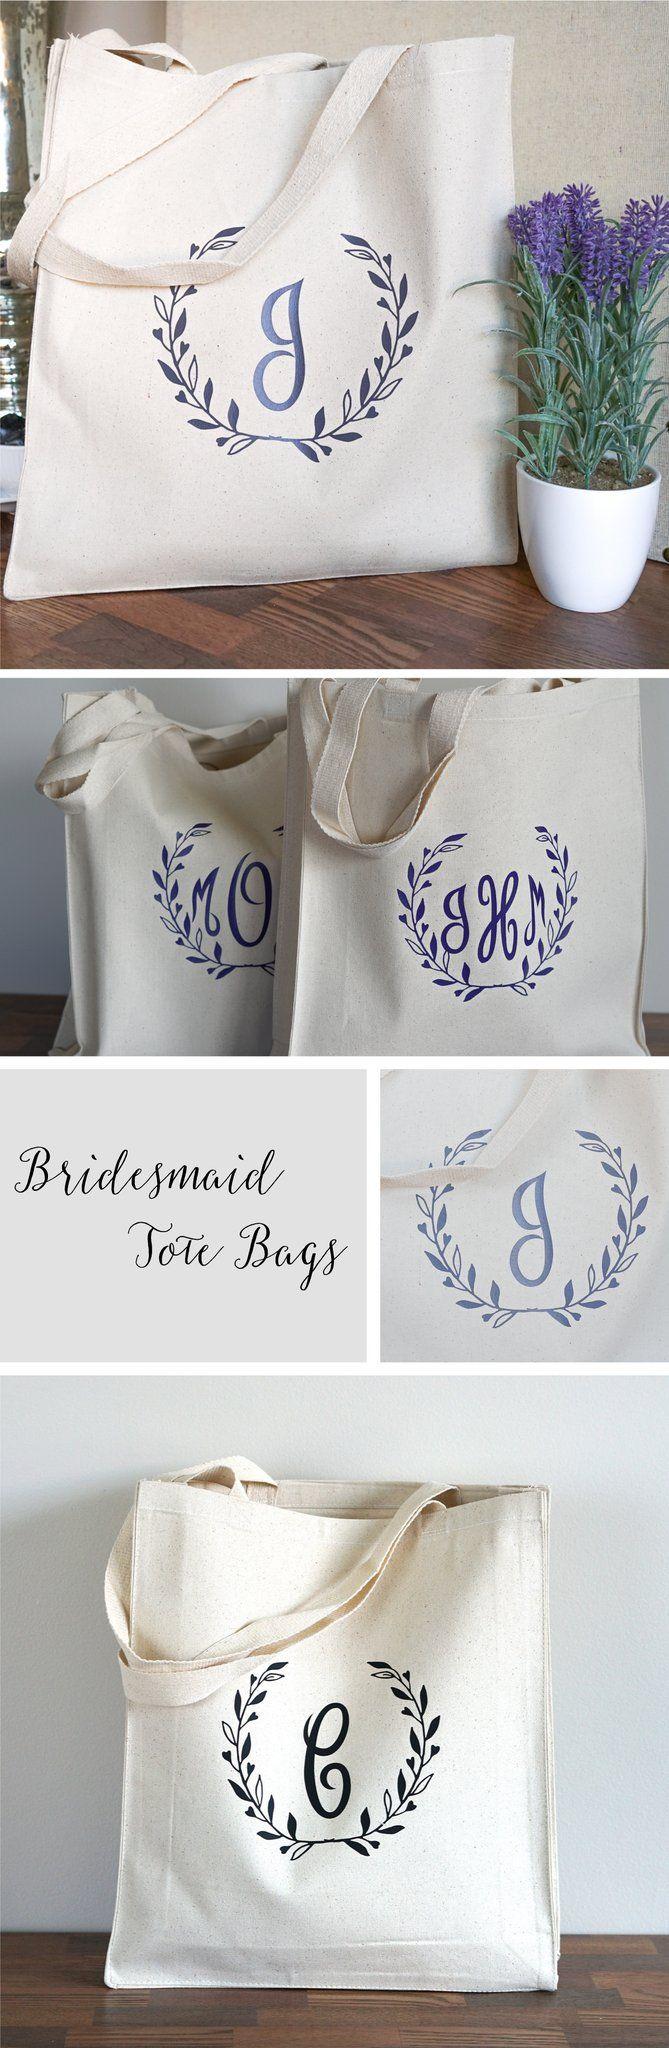 Bridesmaid Tote Bags   Gift Bags for Bridesmaids   Monogrammed Totes